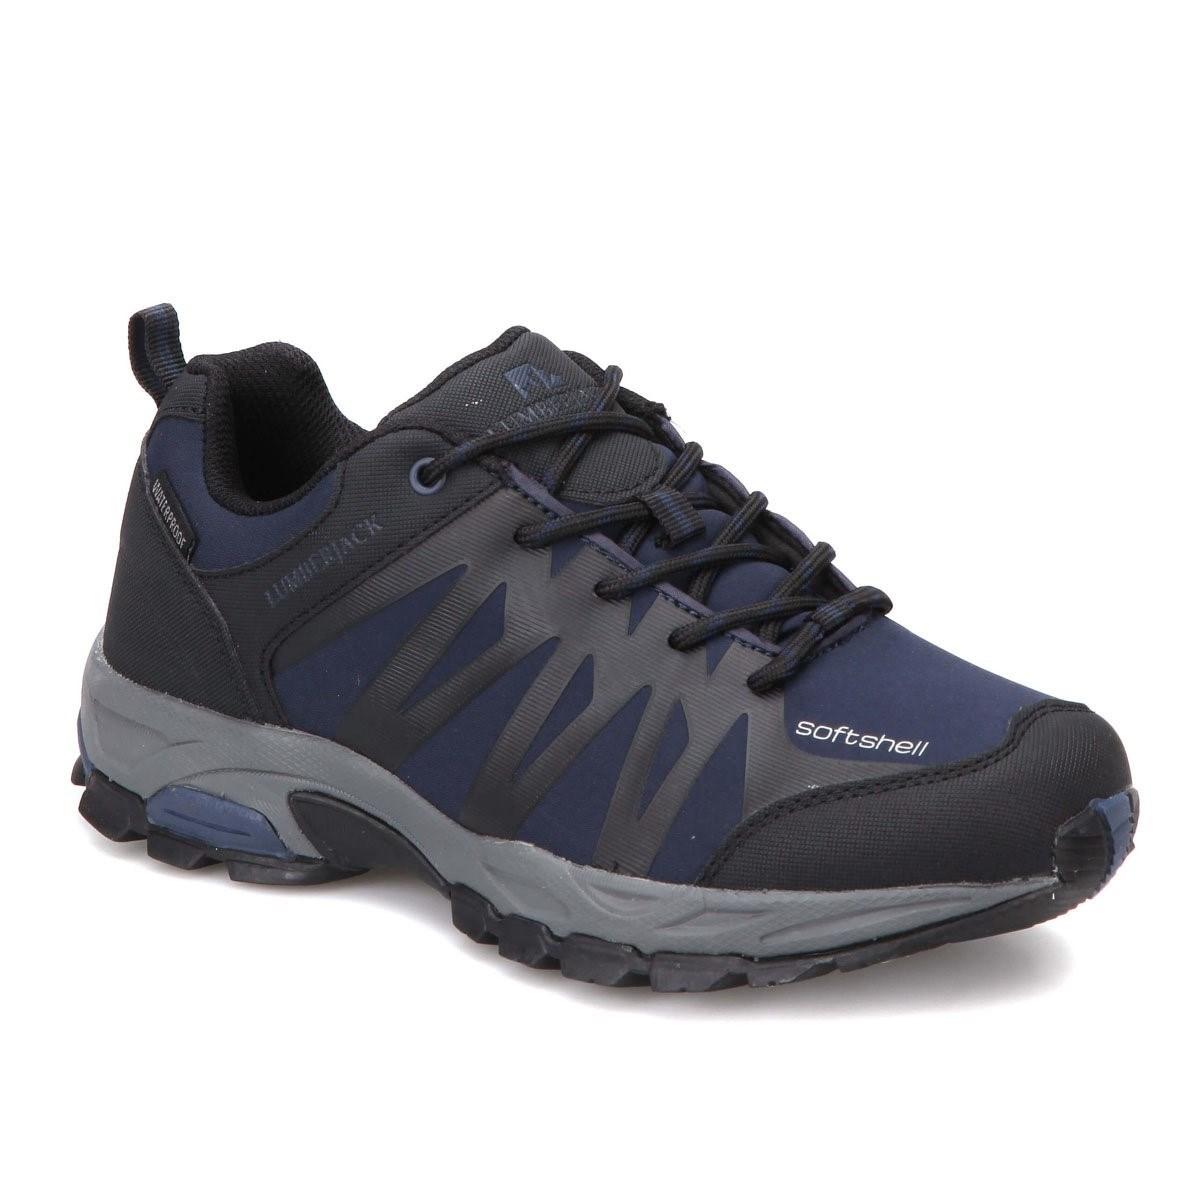 Andor Erkek Lacivert Outdoor Ayakkabı